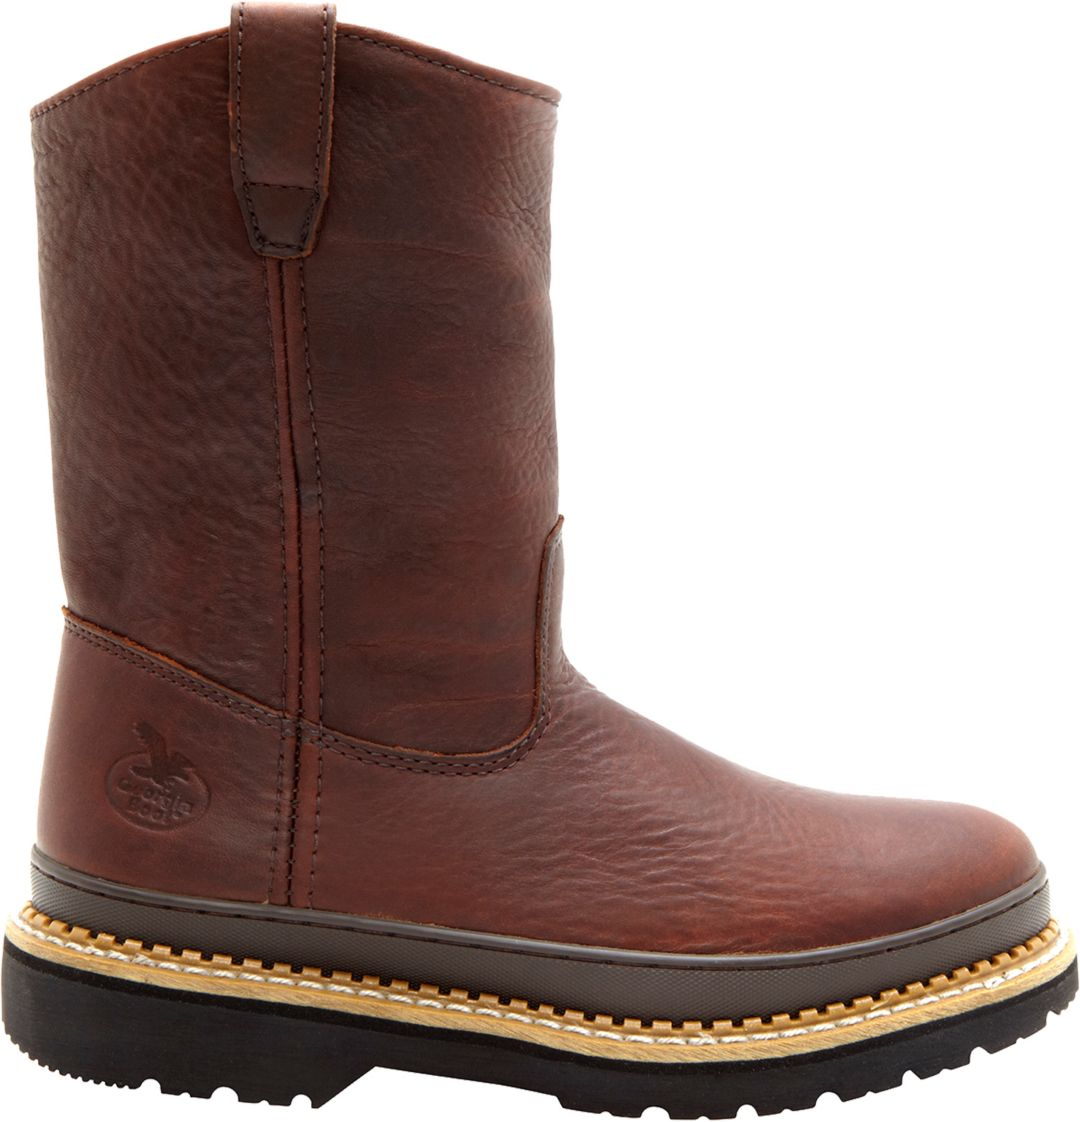 814d0f9e923 Georgia Boot Men's Giant Pull-On 9'' Wellington Steel Toe Work Boots ...